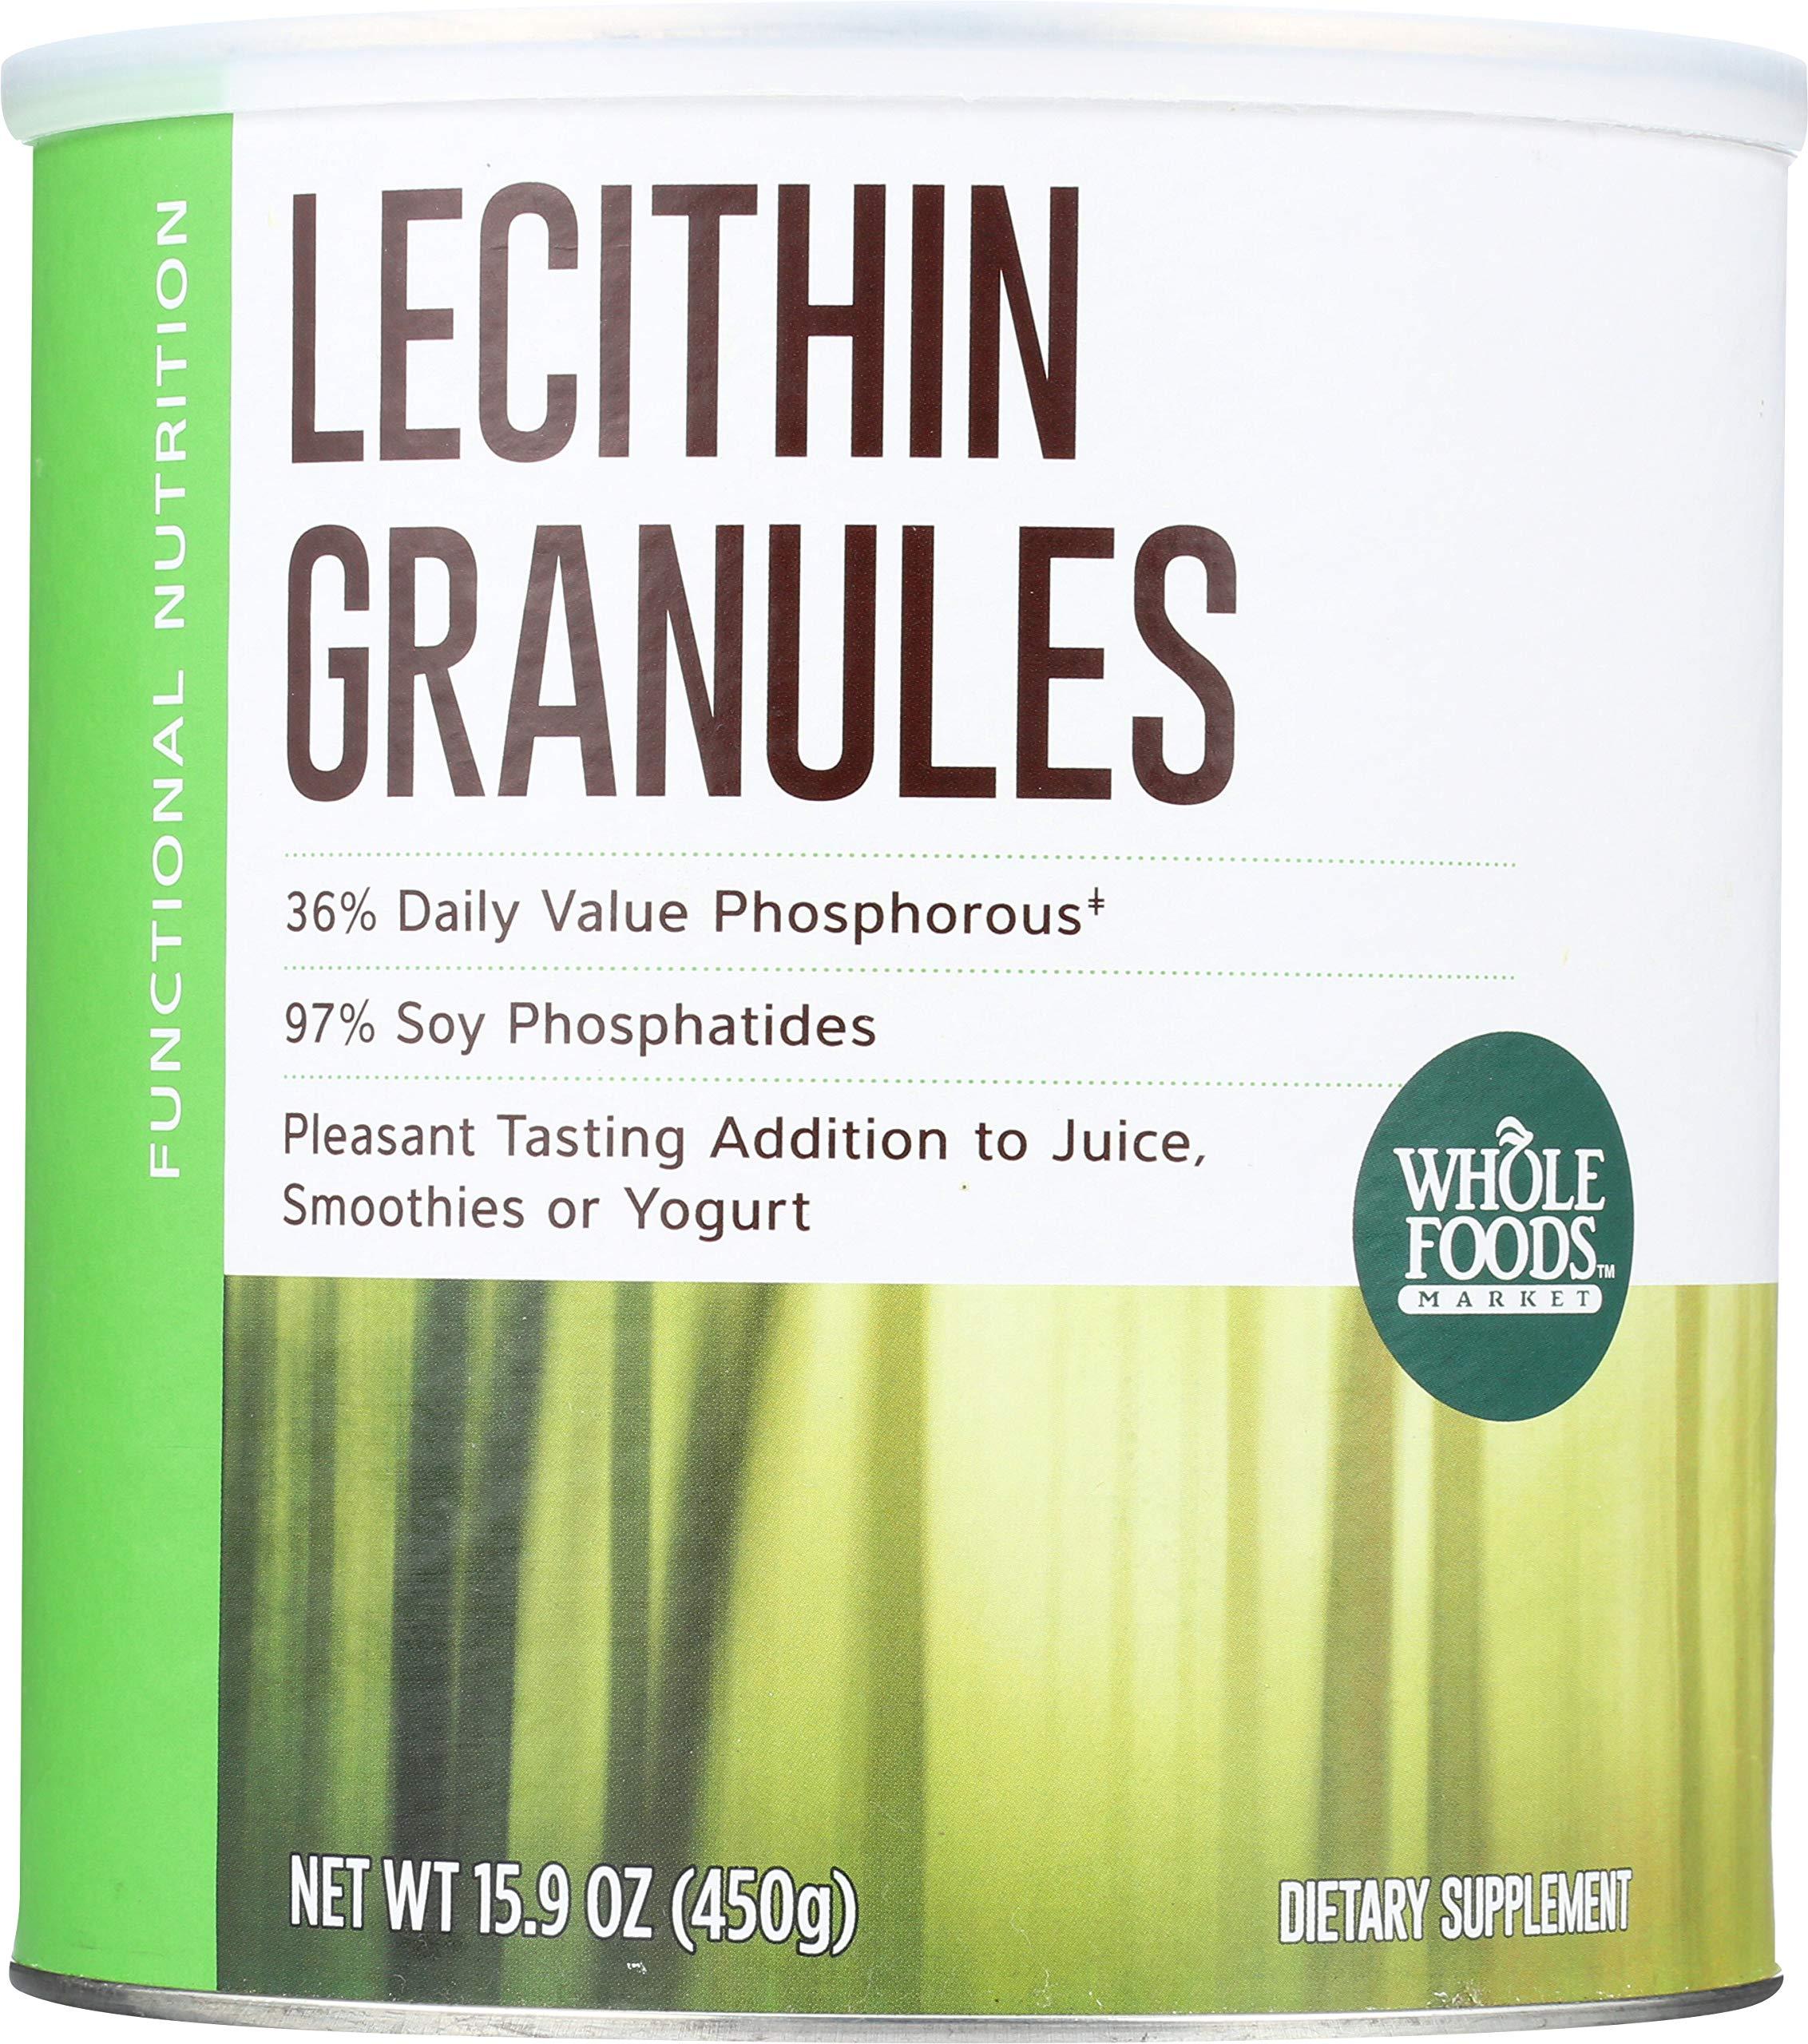 Whole Foods Market, Lecithin Granules, 15.9 oz by Whole Foods Market